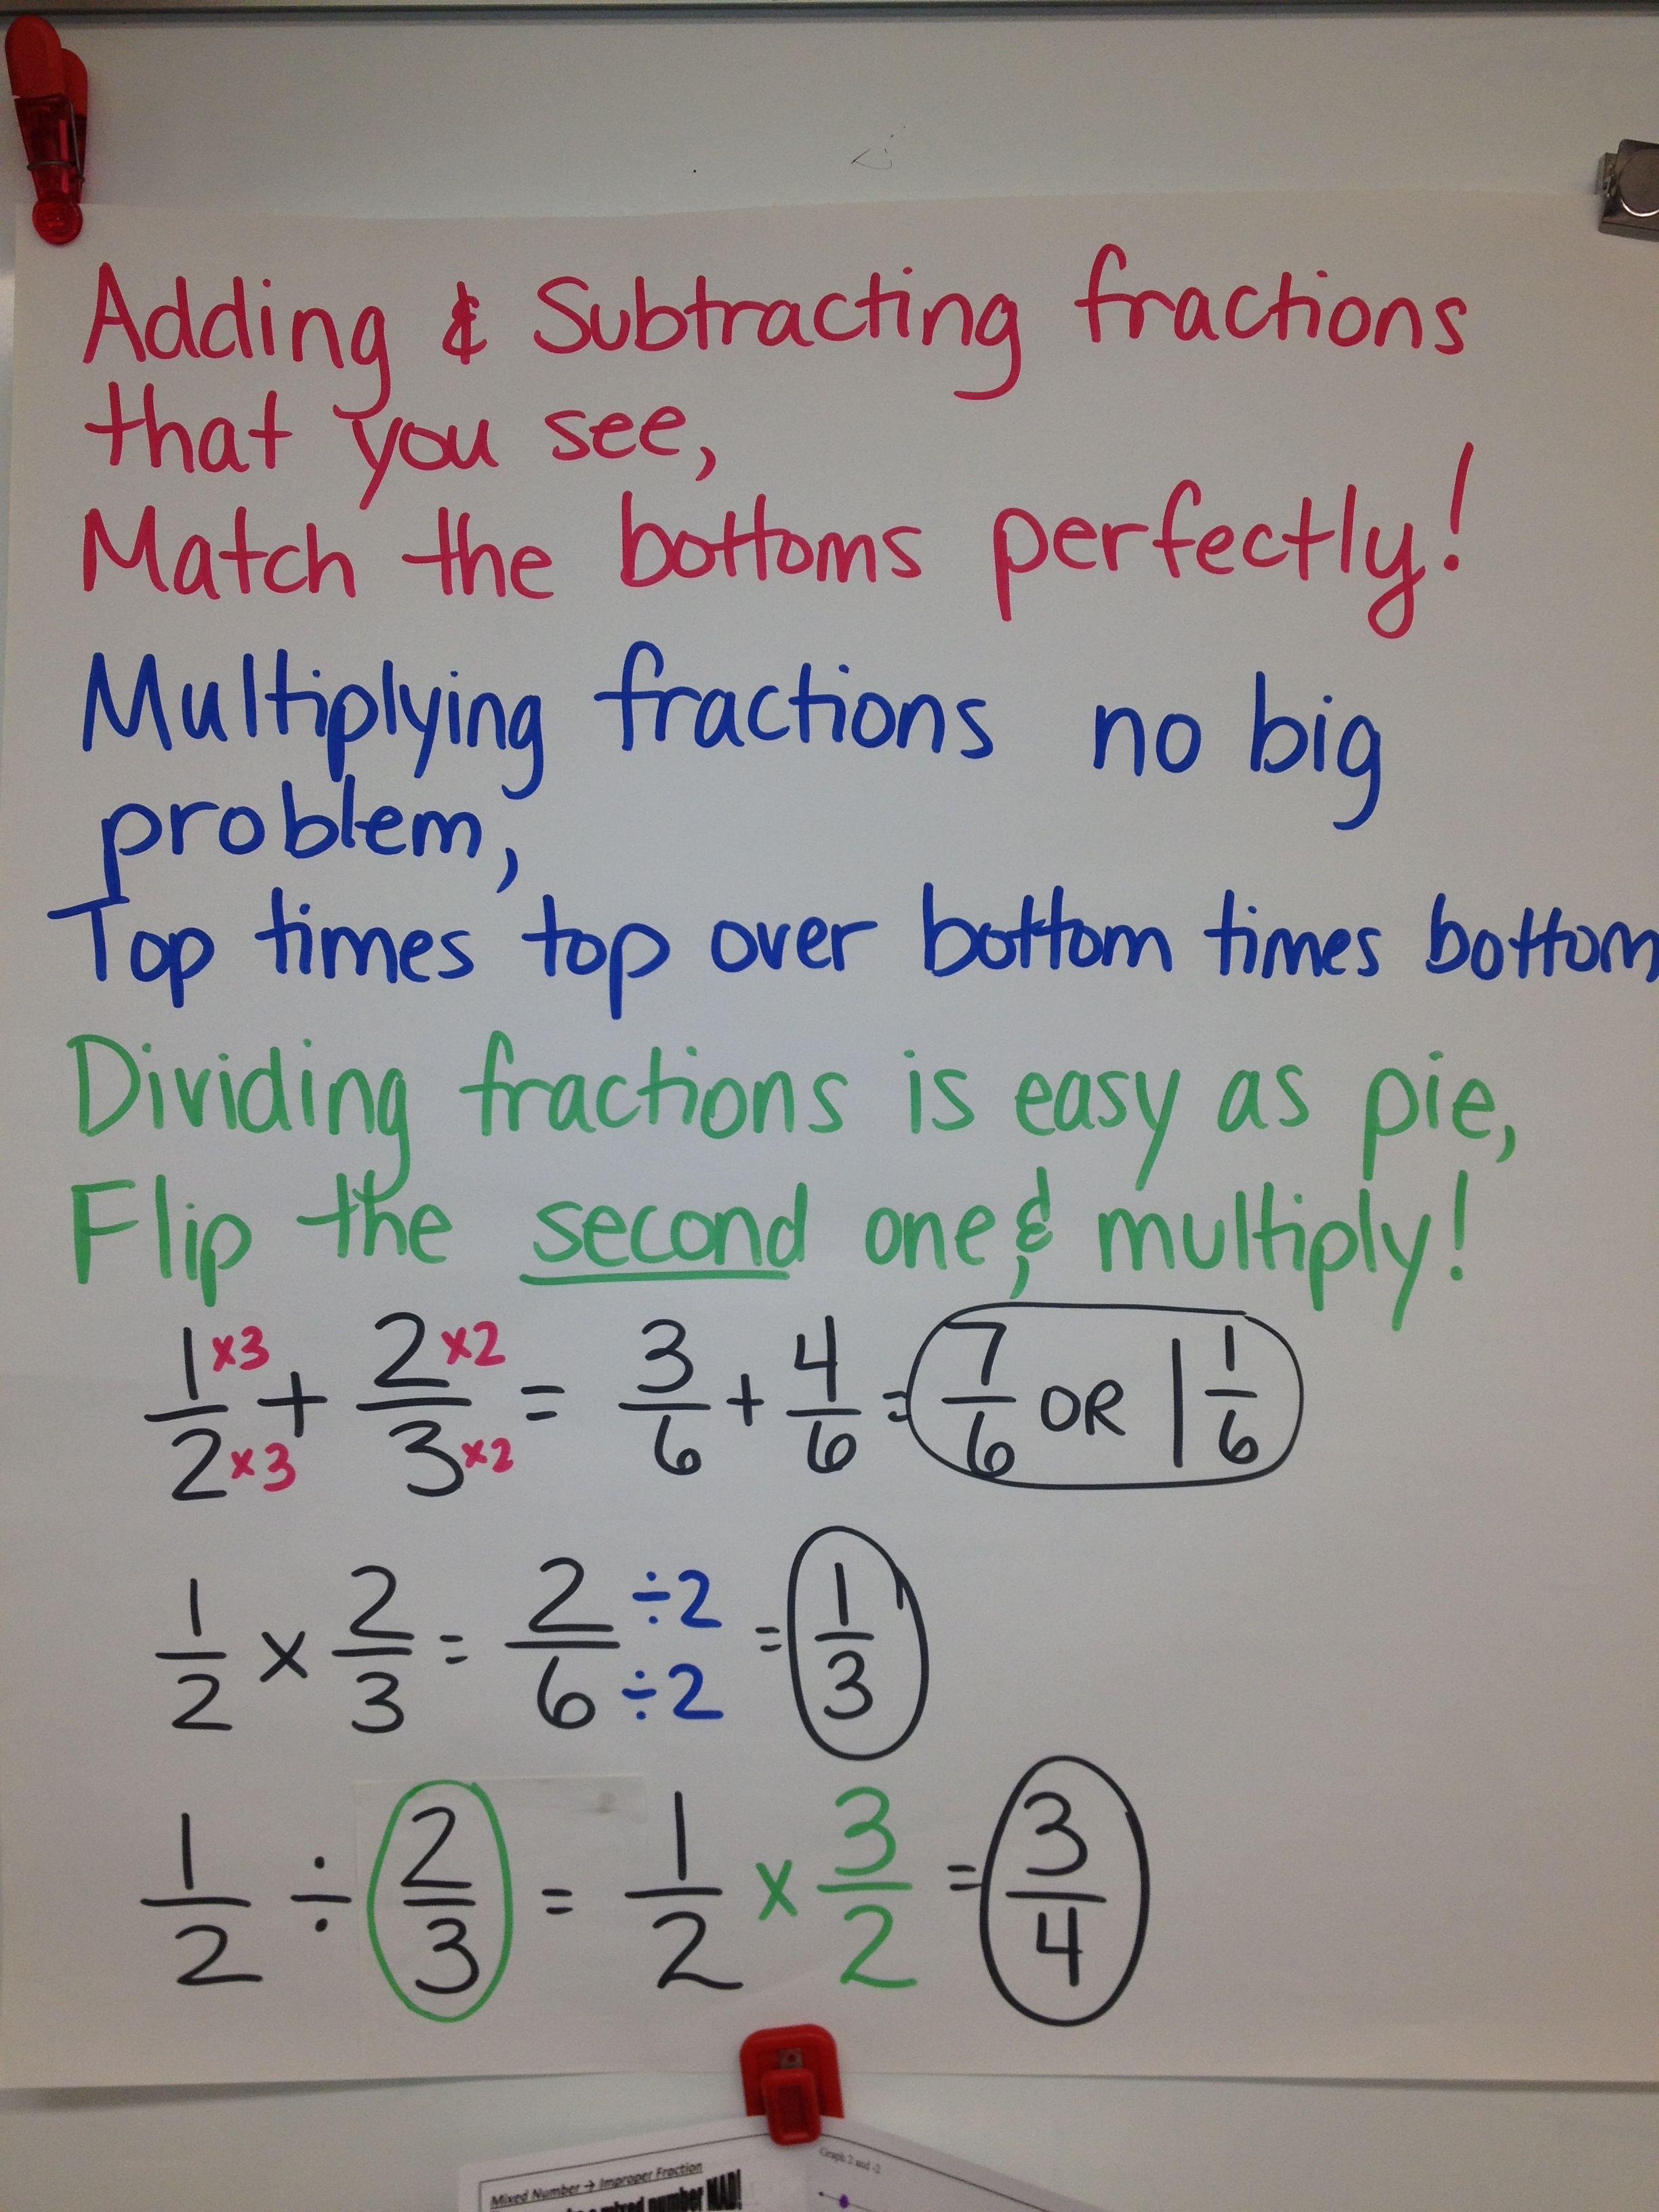 Linear Improper Fraction To Mixed Number Worksheet